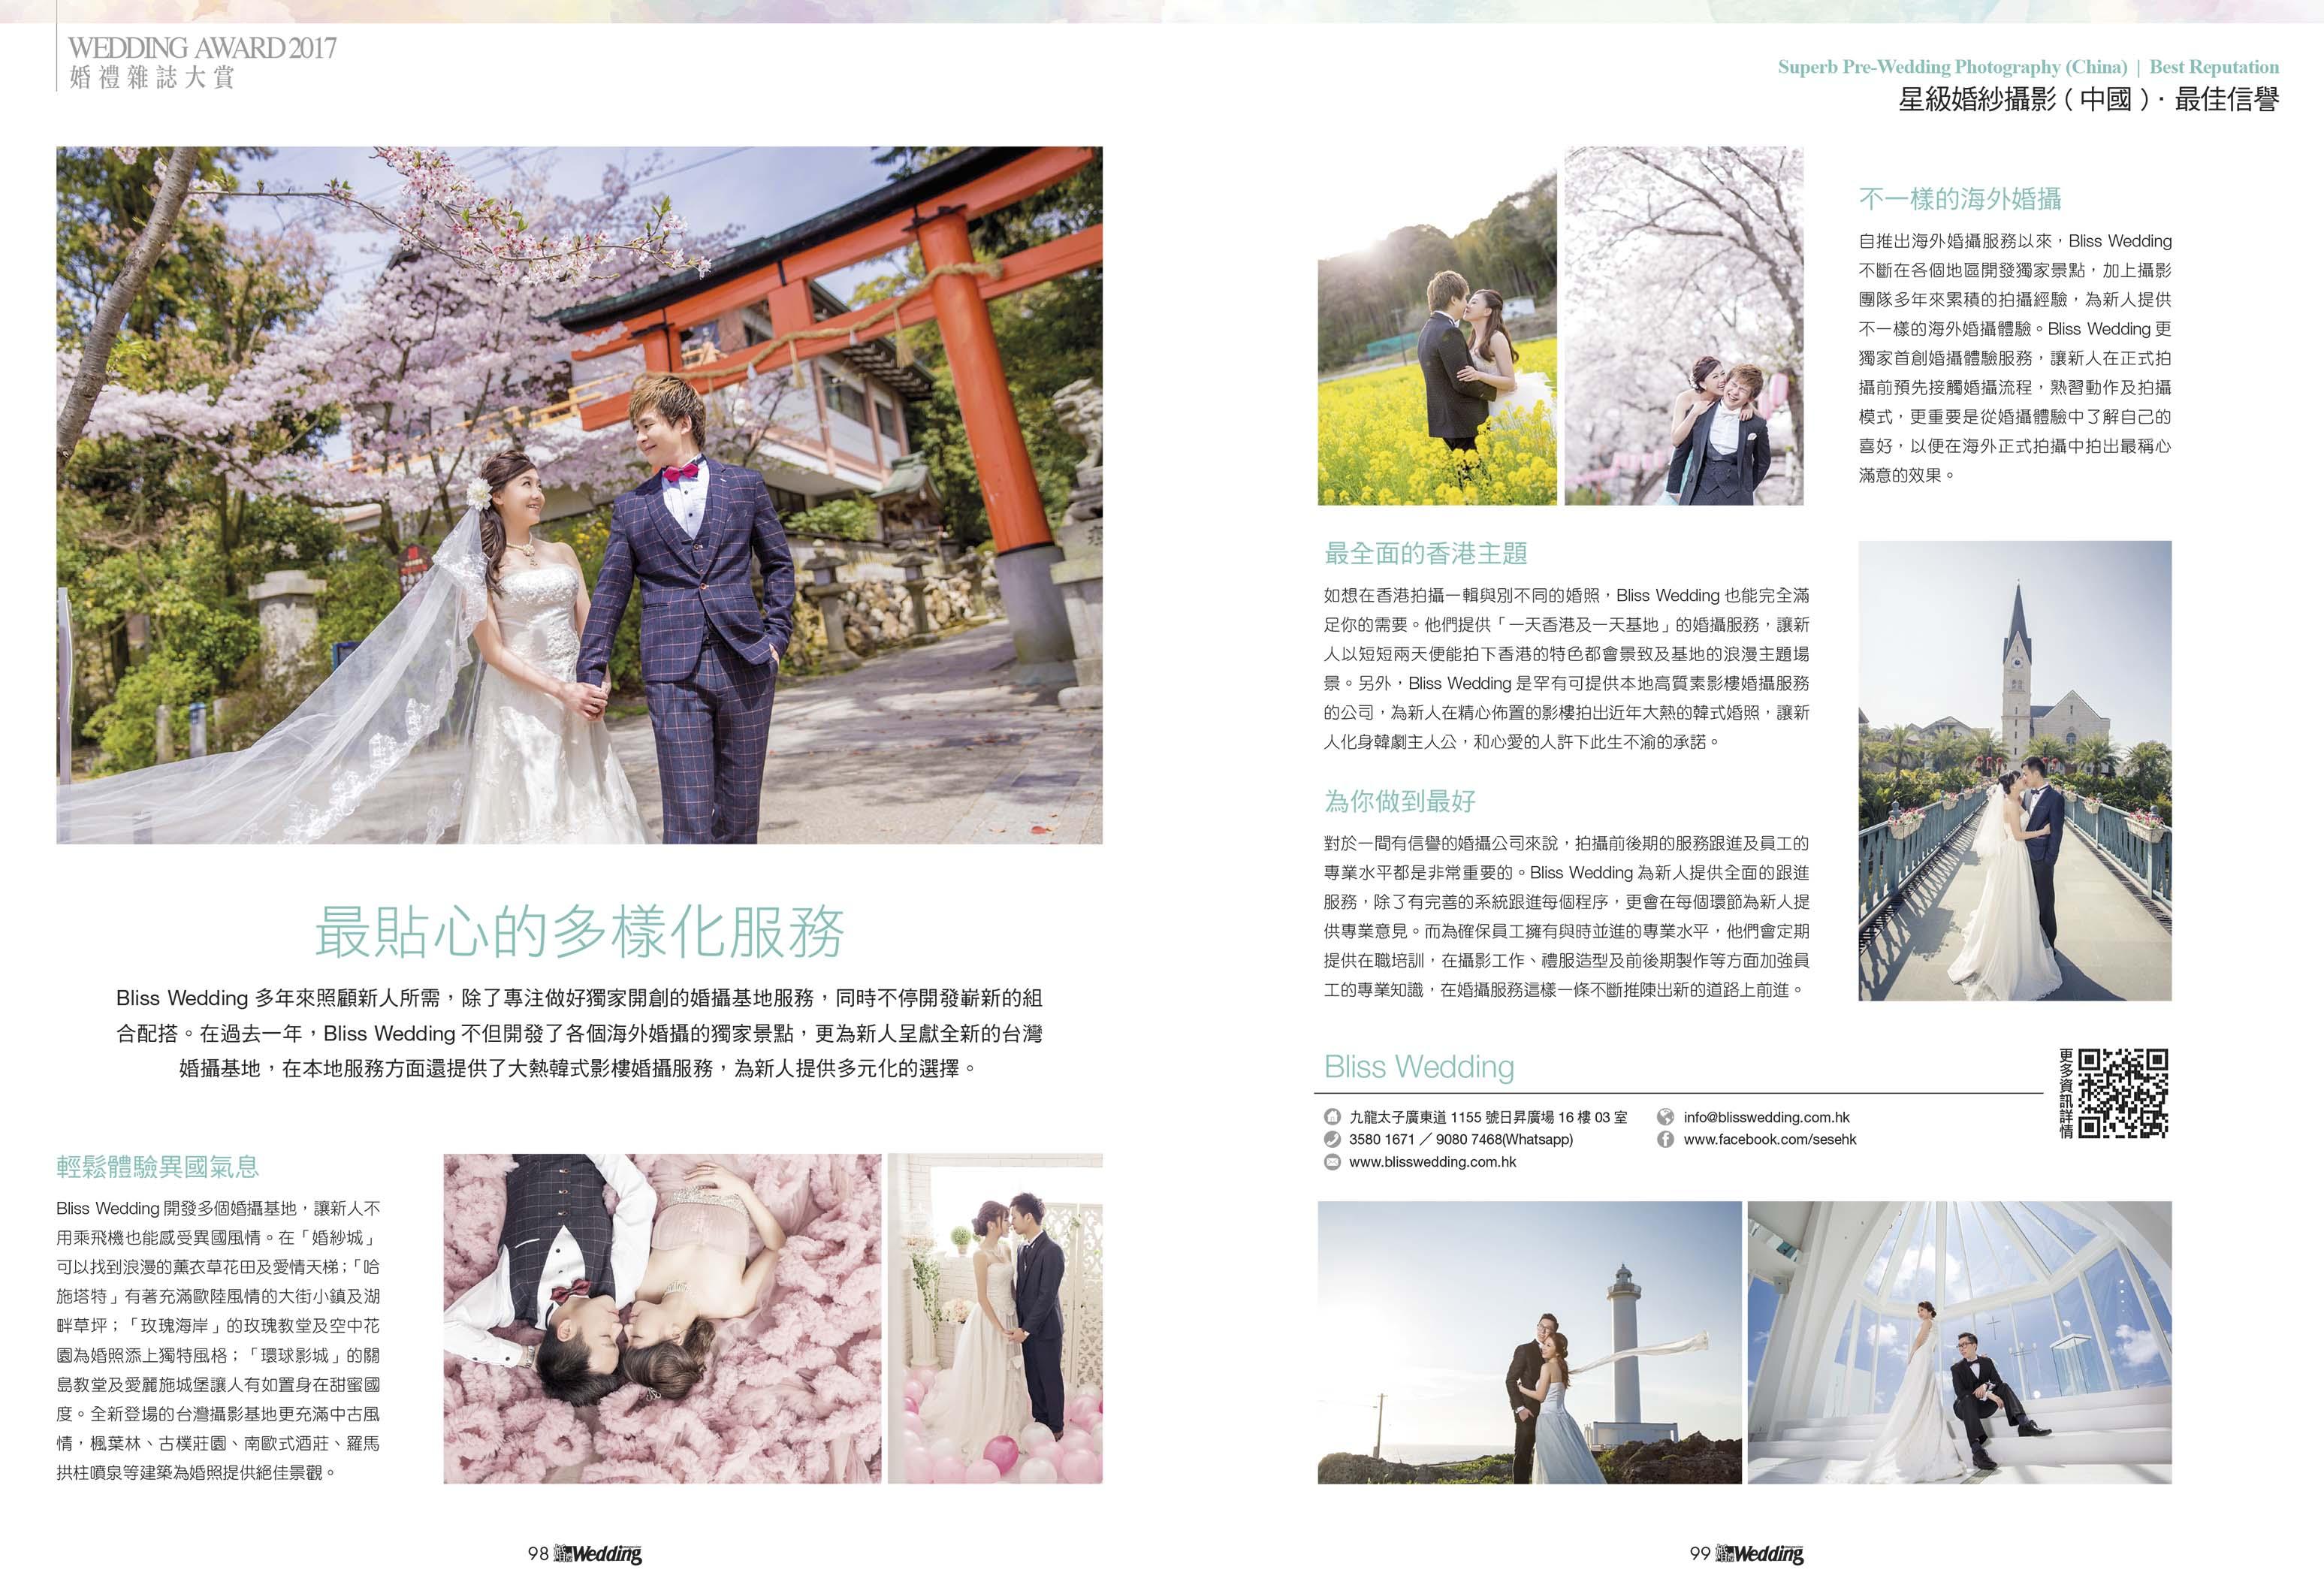 wedding-magazine-2017-awards-b